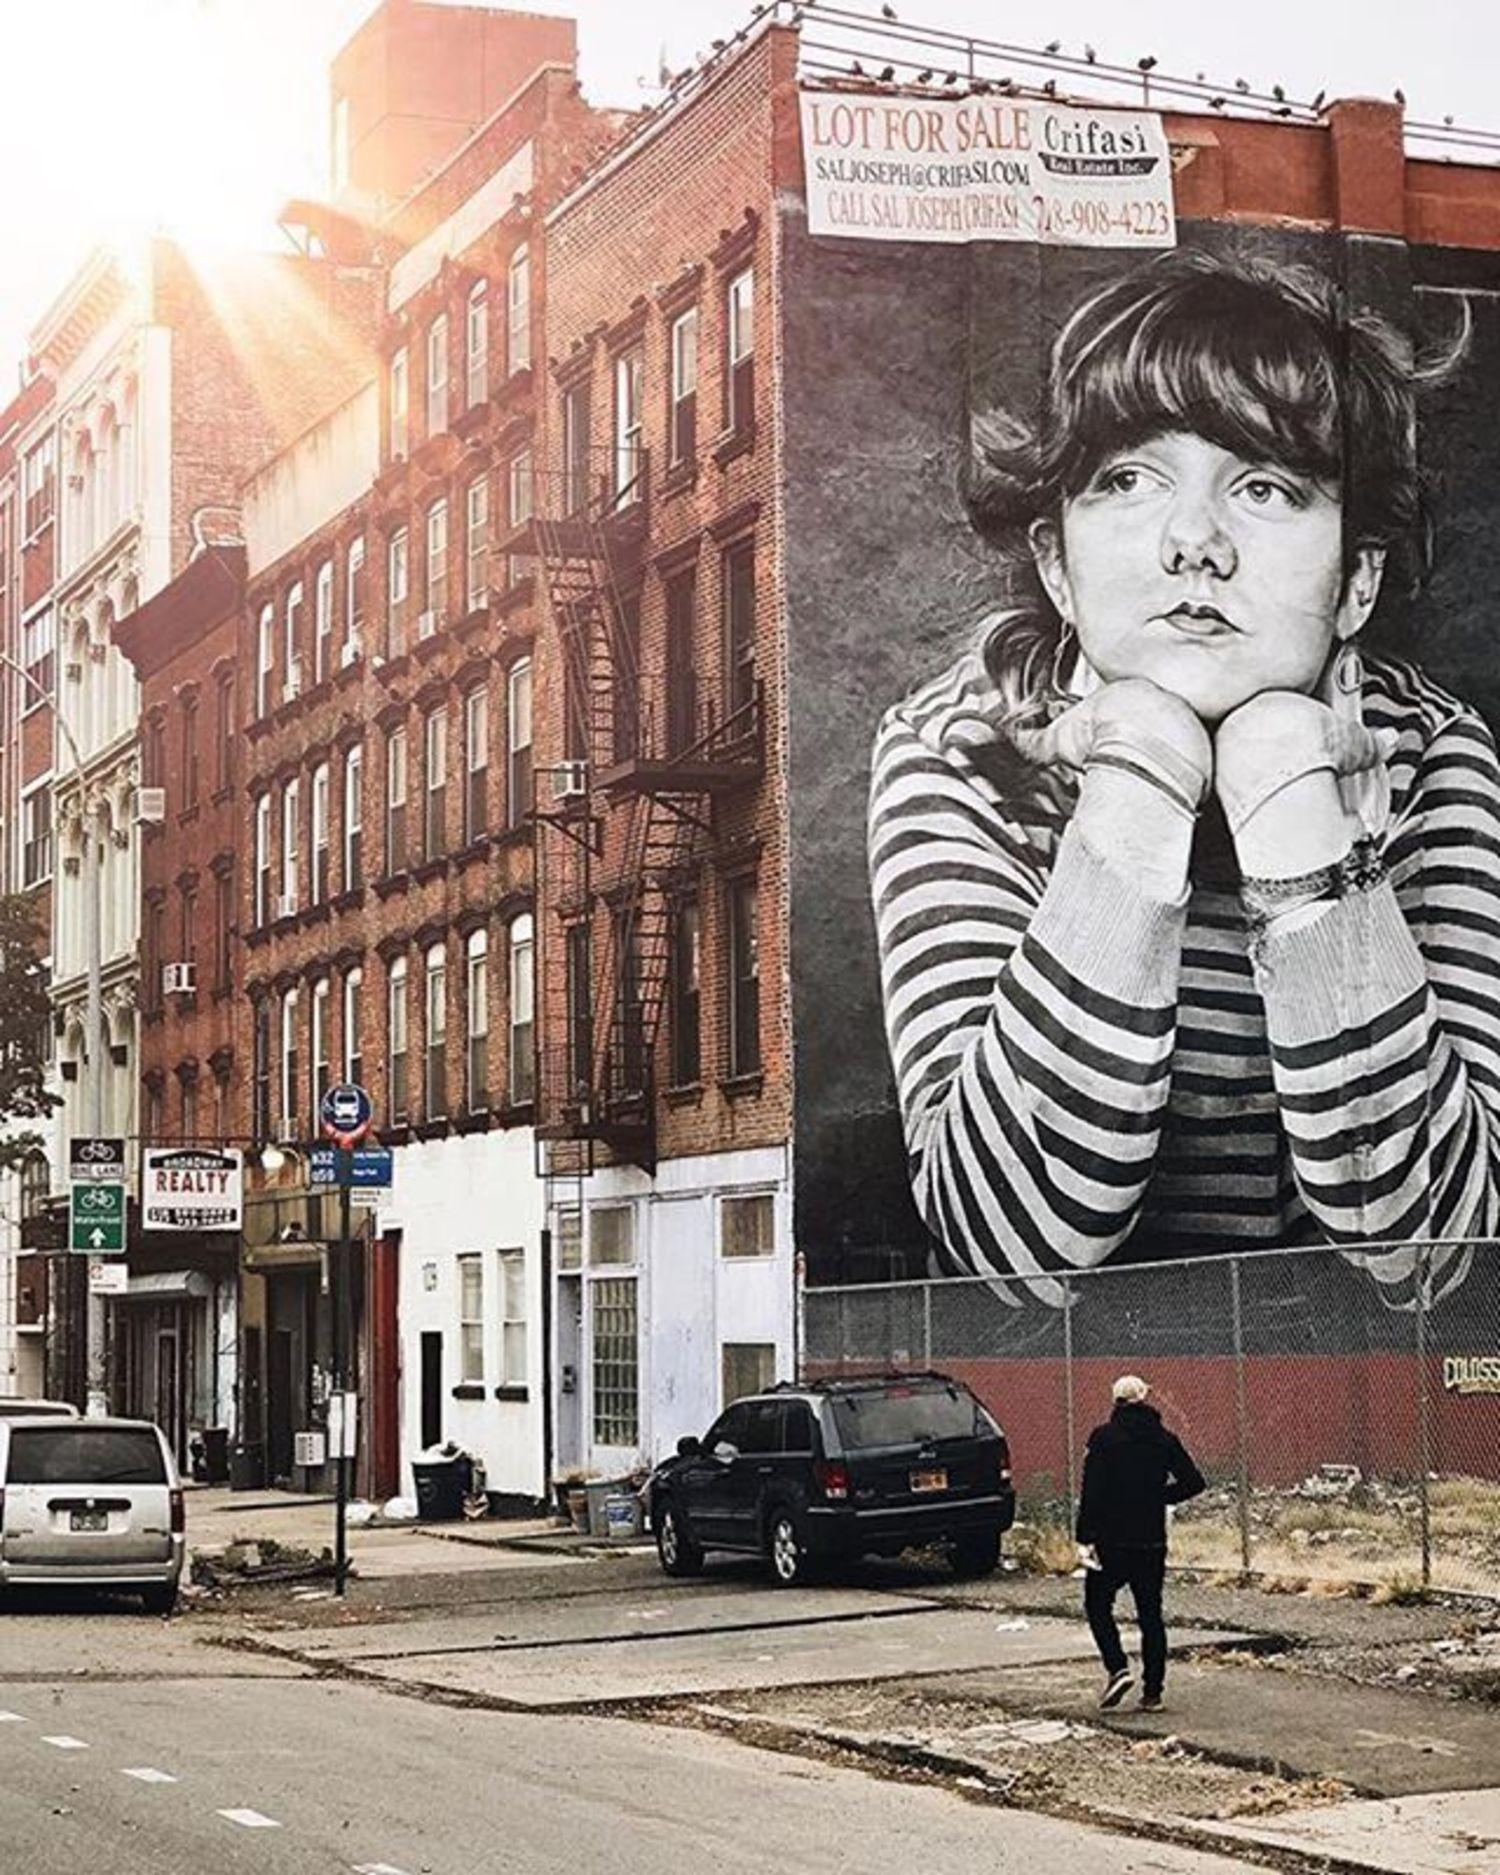 Williamsburg, Brooklyn, New York. Photo via @melliekr #viewingnyc #newyork #newyorkcity #nyc